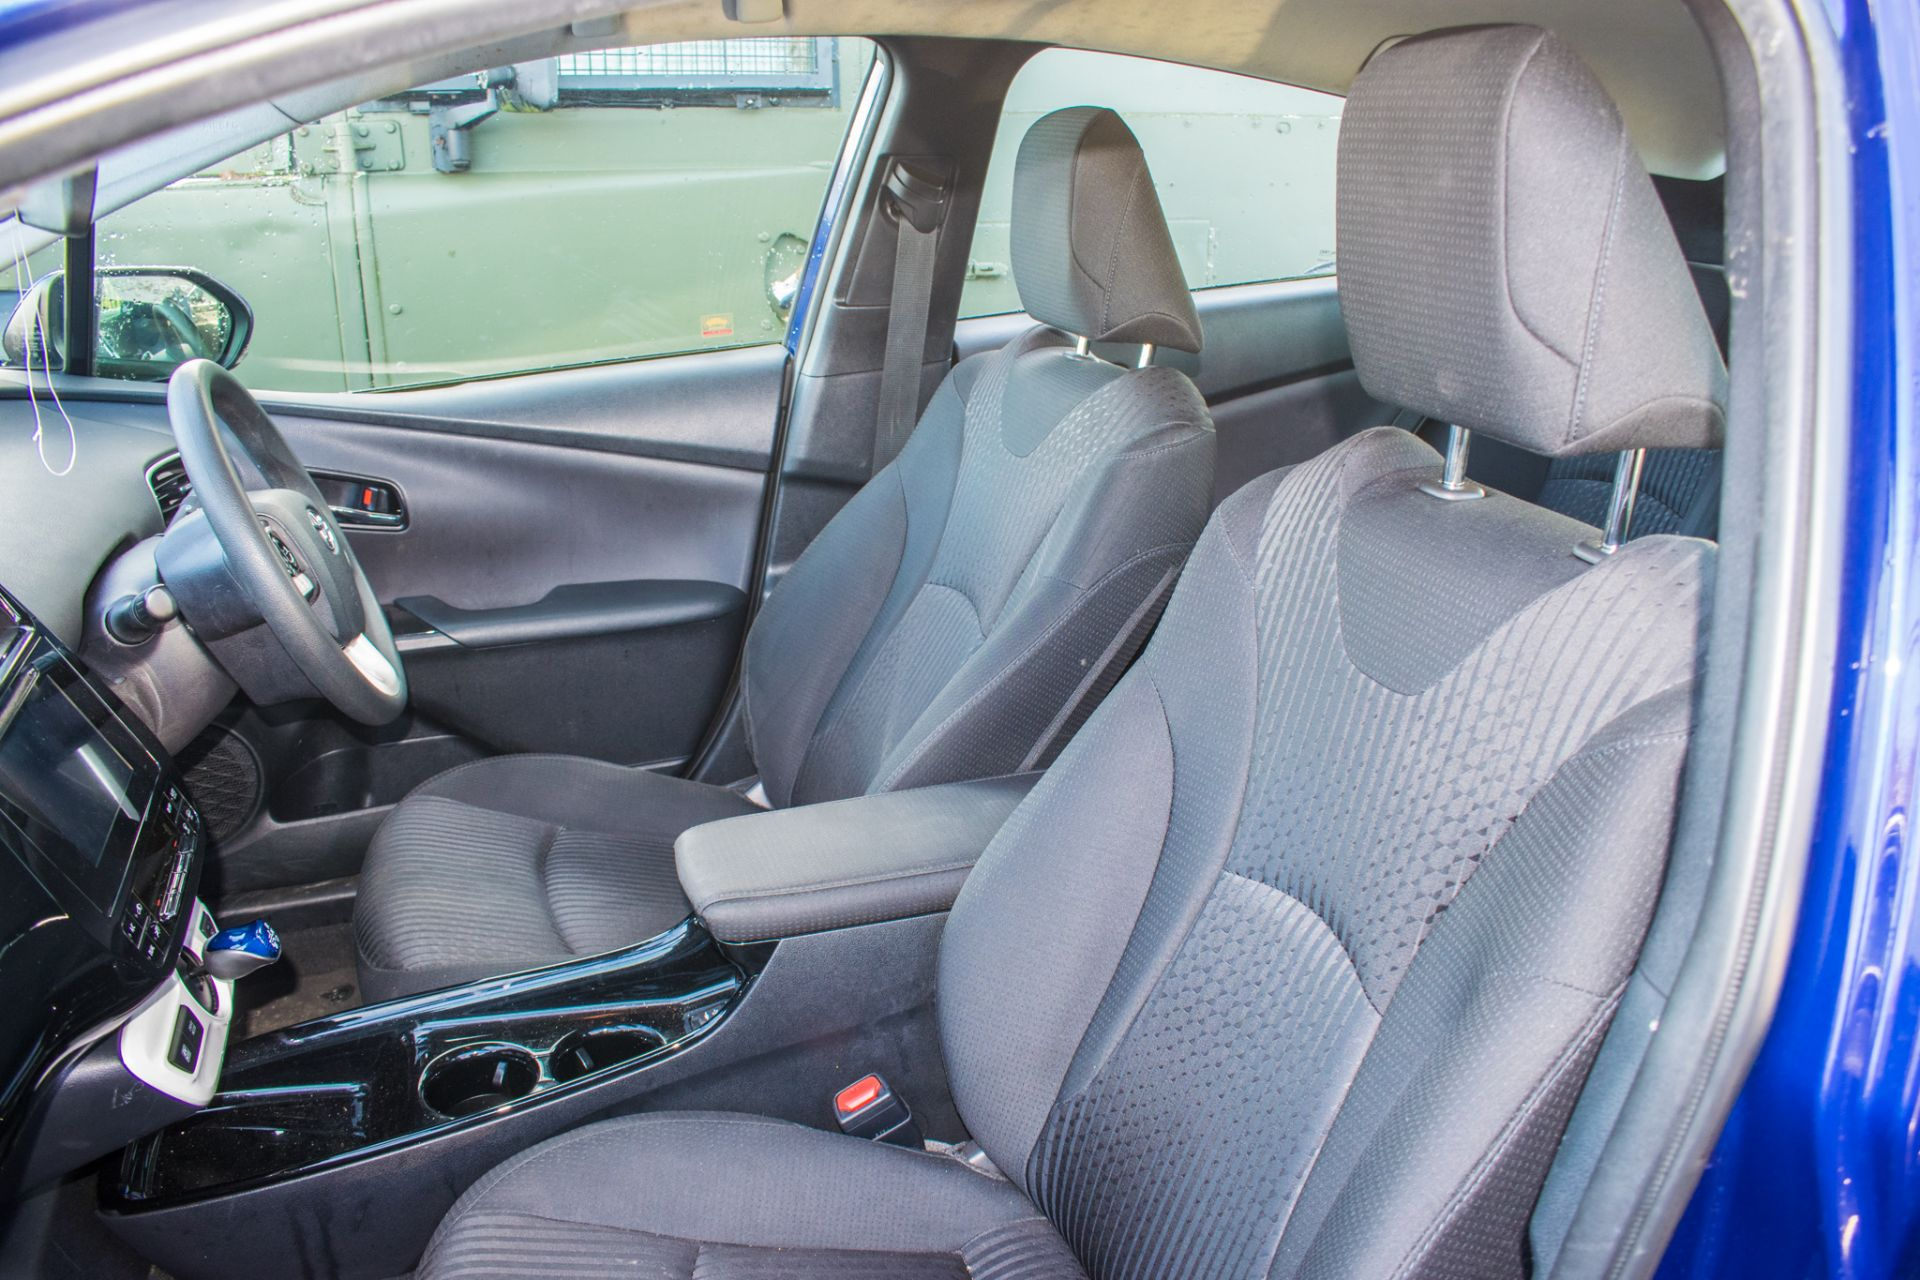 ToyotaPrius ActiveHybrid Electric 5 doorHatchback  Registration Number: LM67 OKH Date of First - Image 14 of 17